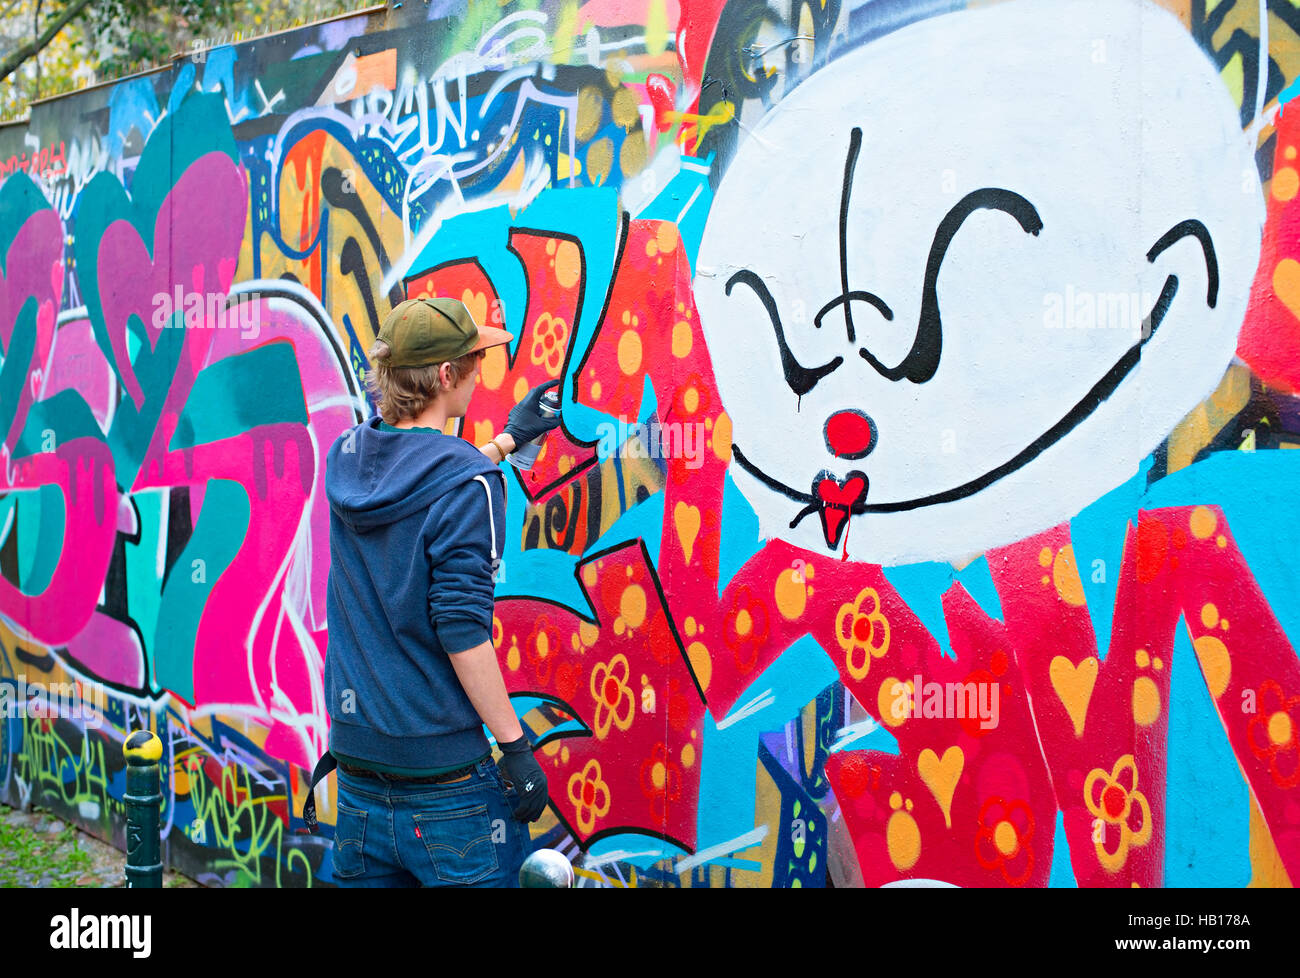 Teenager Graffiti Painter